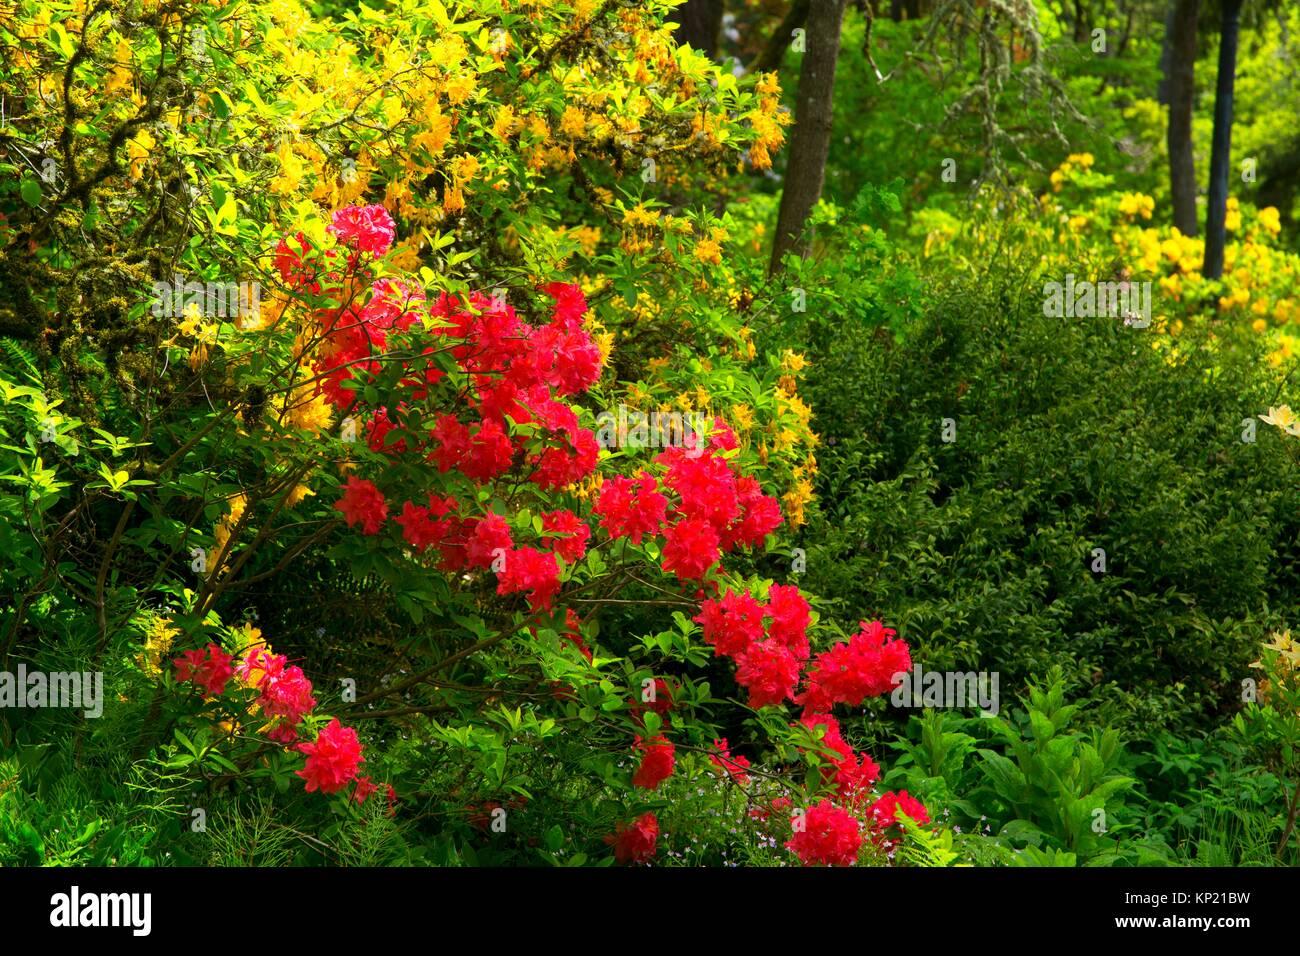 Azalea and rhododendron bloom, Rhododendron Garden, Hendricks Park, Eugene, Oregon. - Stock Image